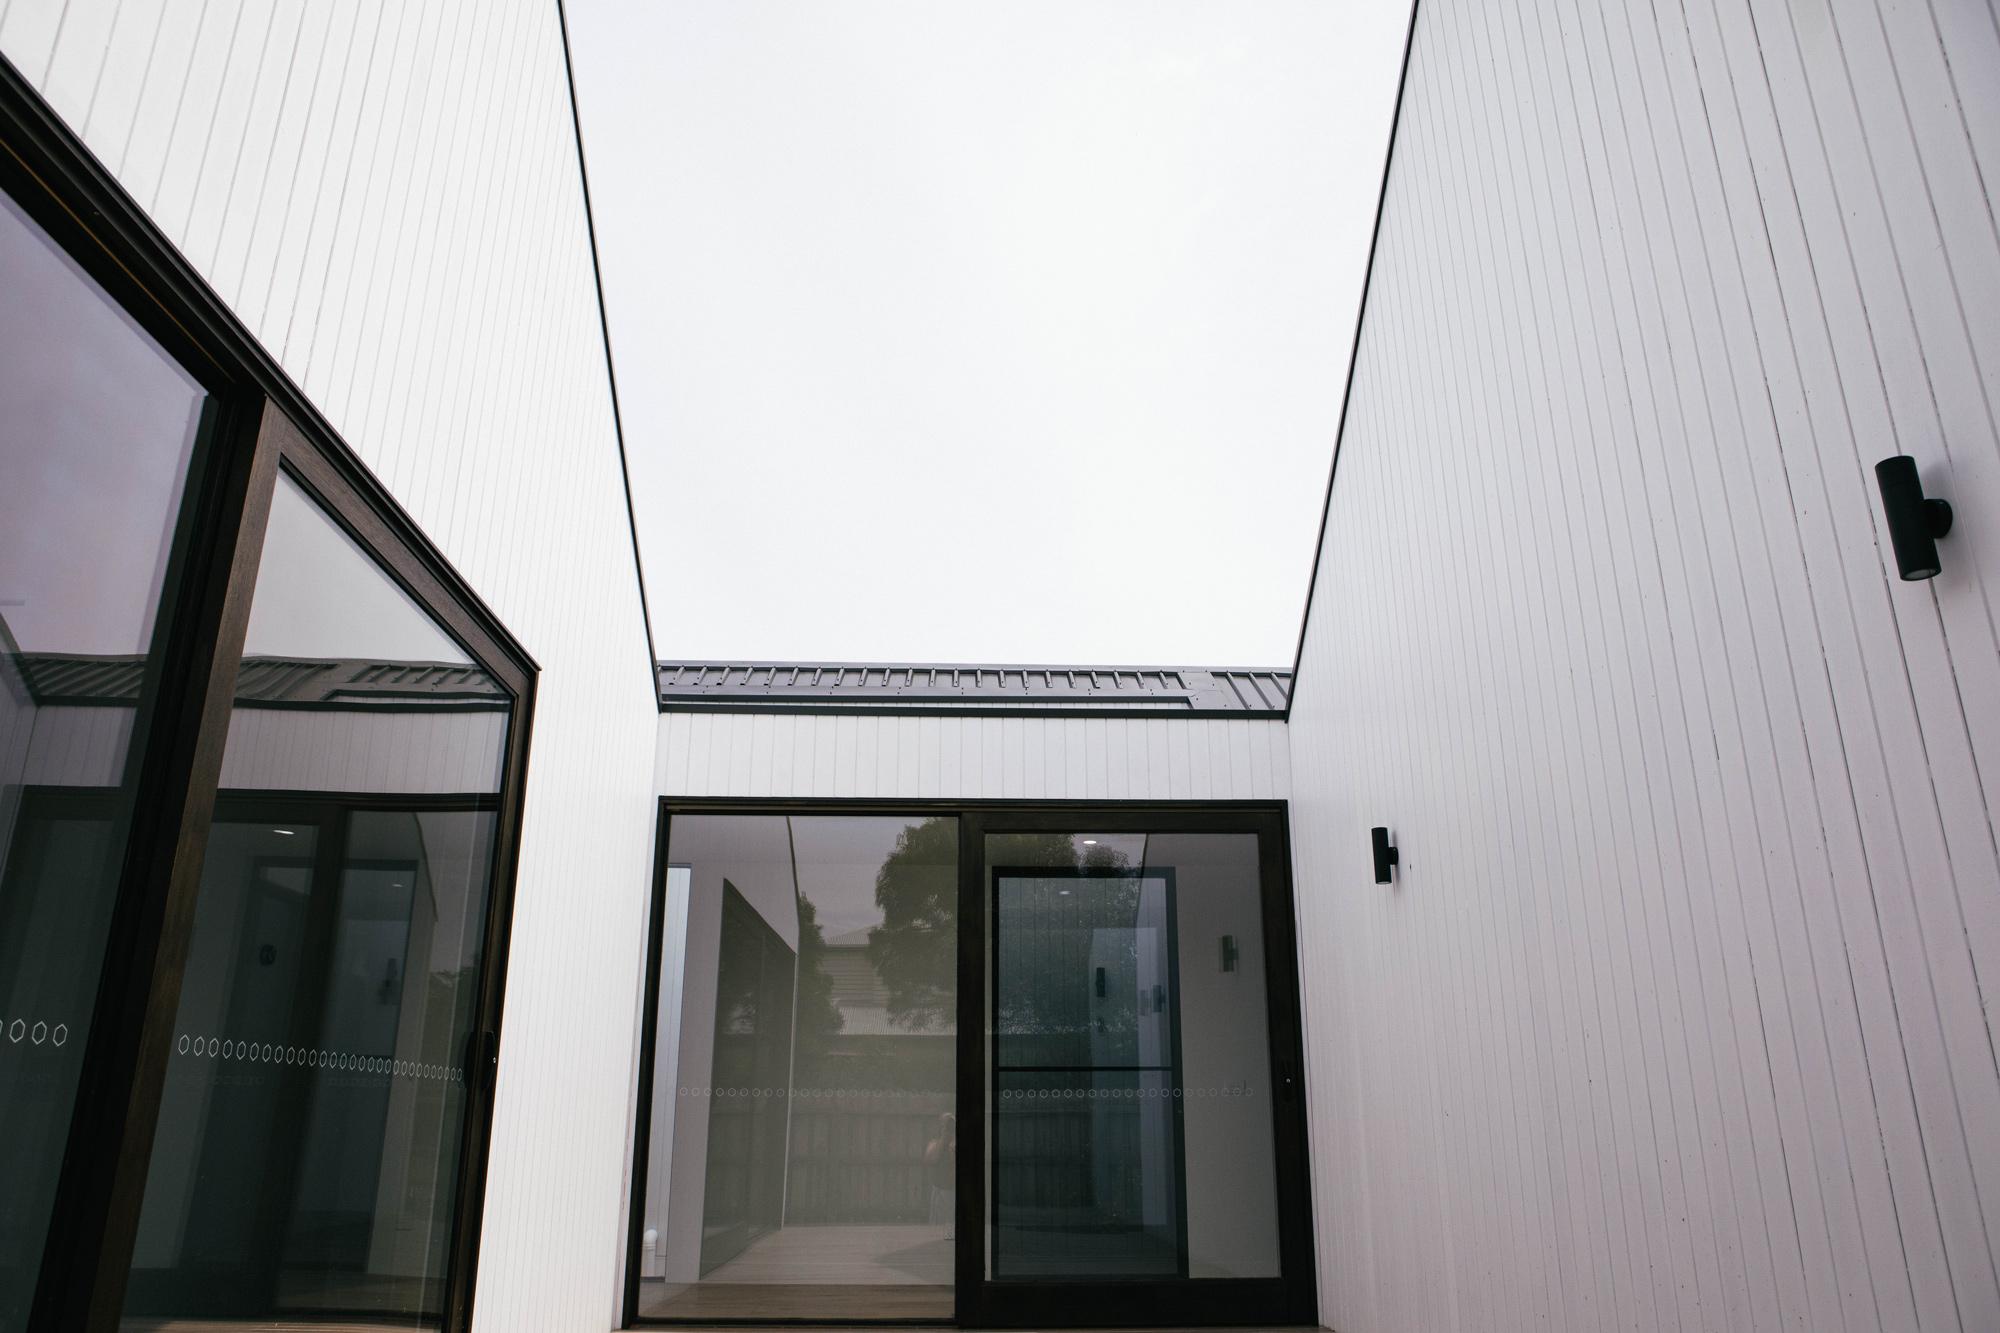 01_LIFESPACESGROUP_scandi_house_exterior.jpg